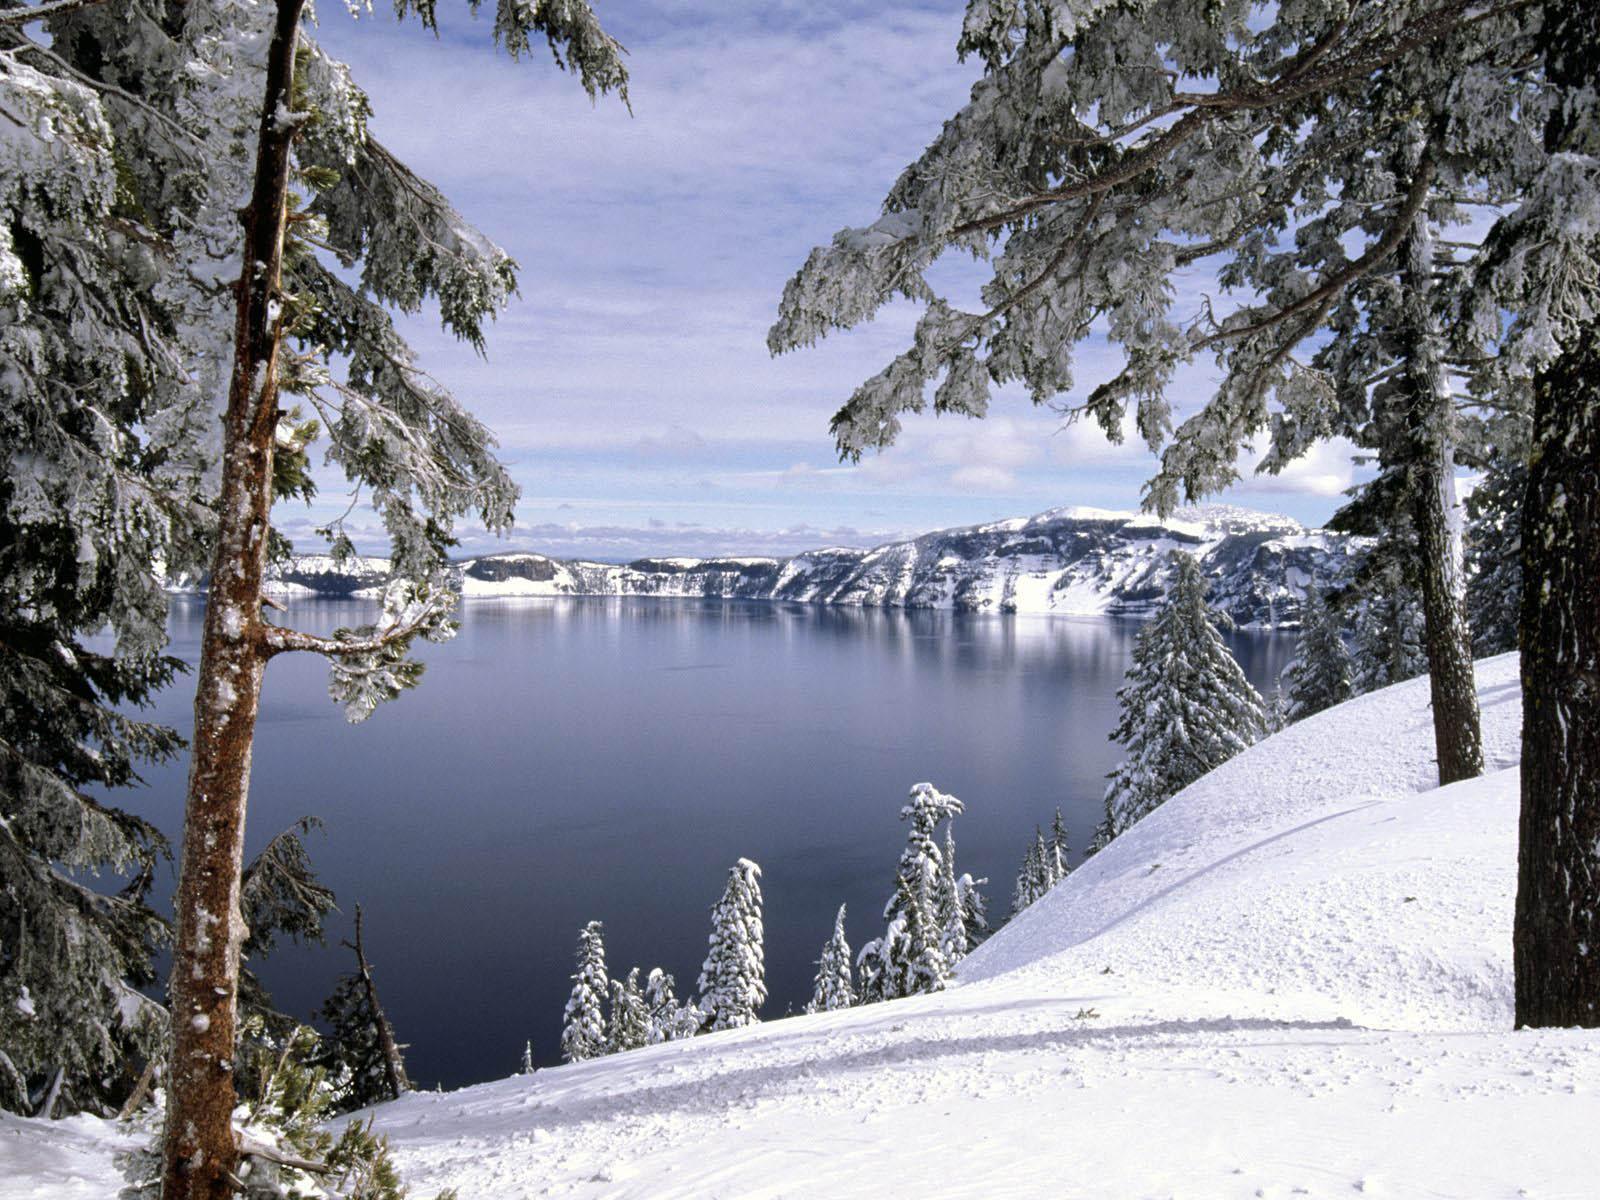 Winter Desktop Wallpapers and Backgroundswallpapers 1600x1200